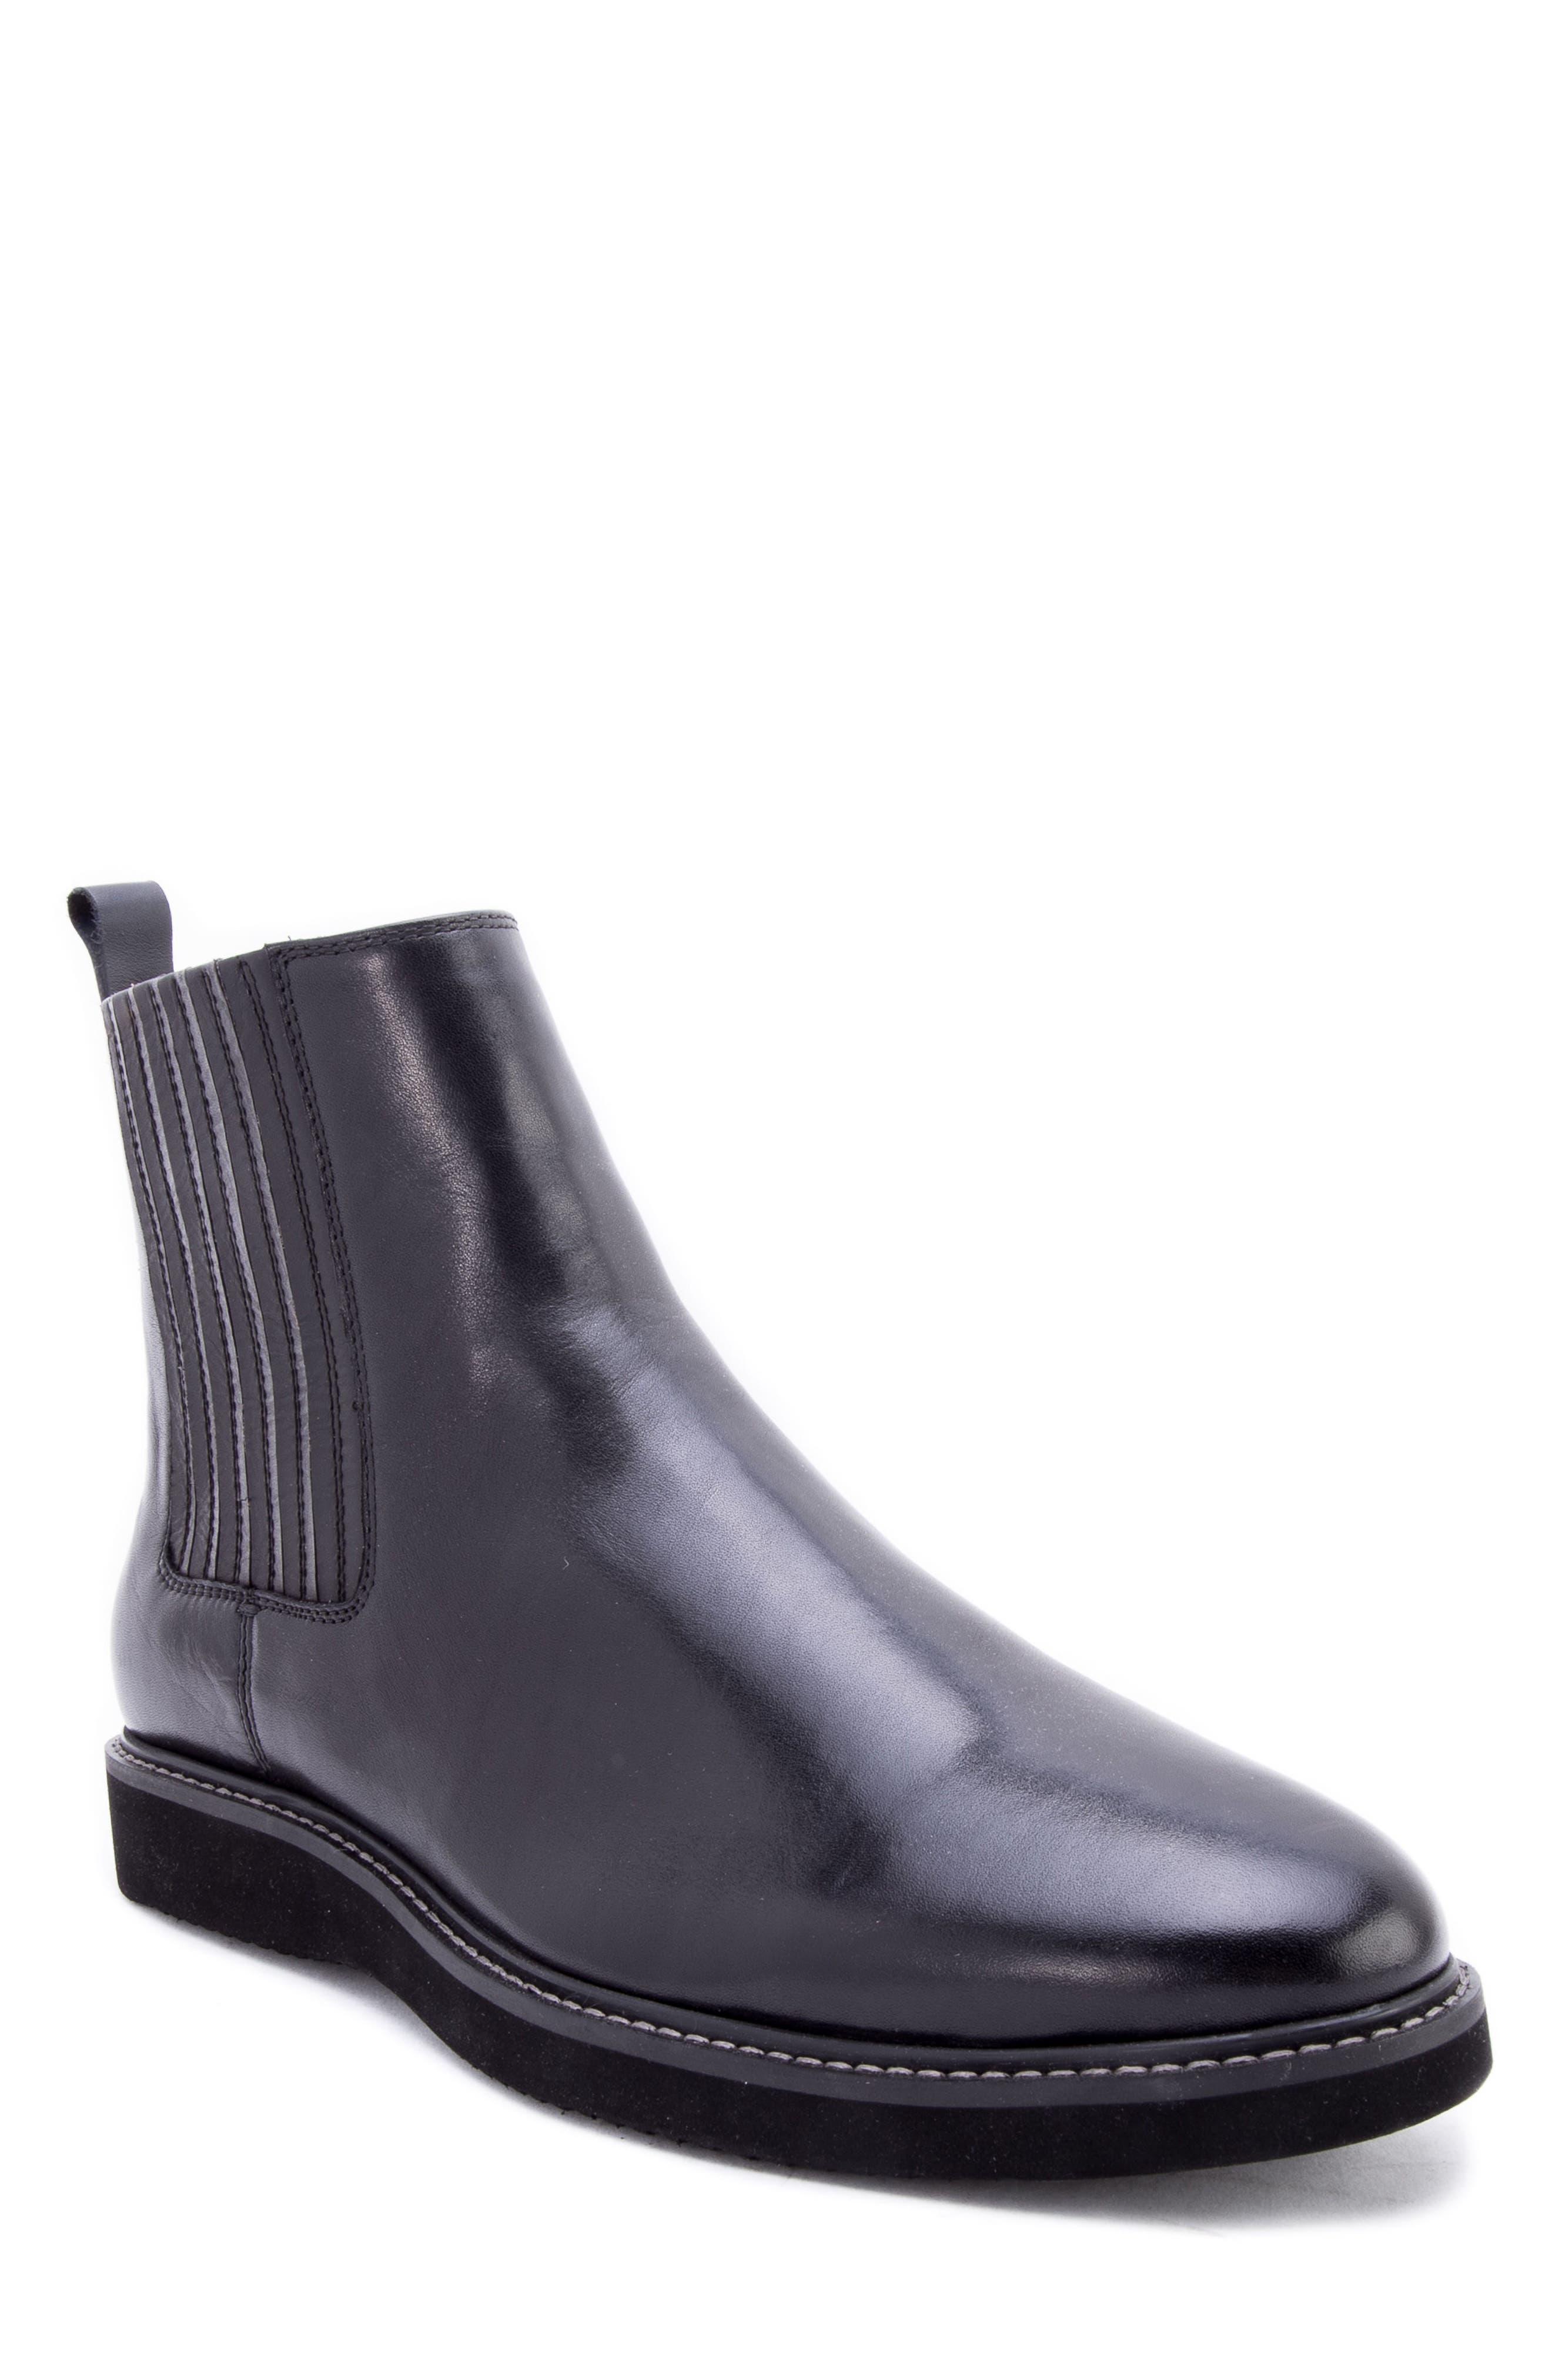 Zanzara Warlow Chelsea Boot, Black